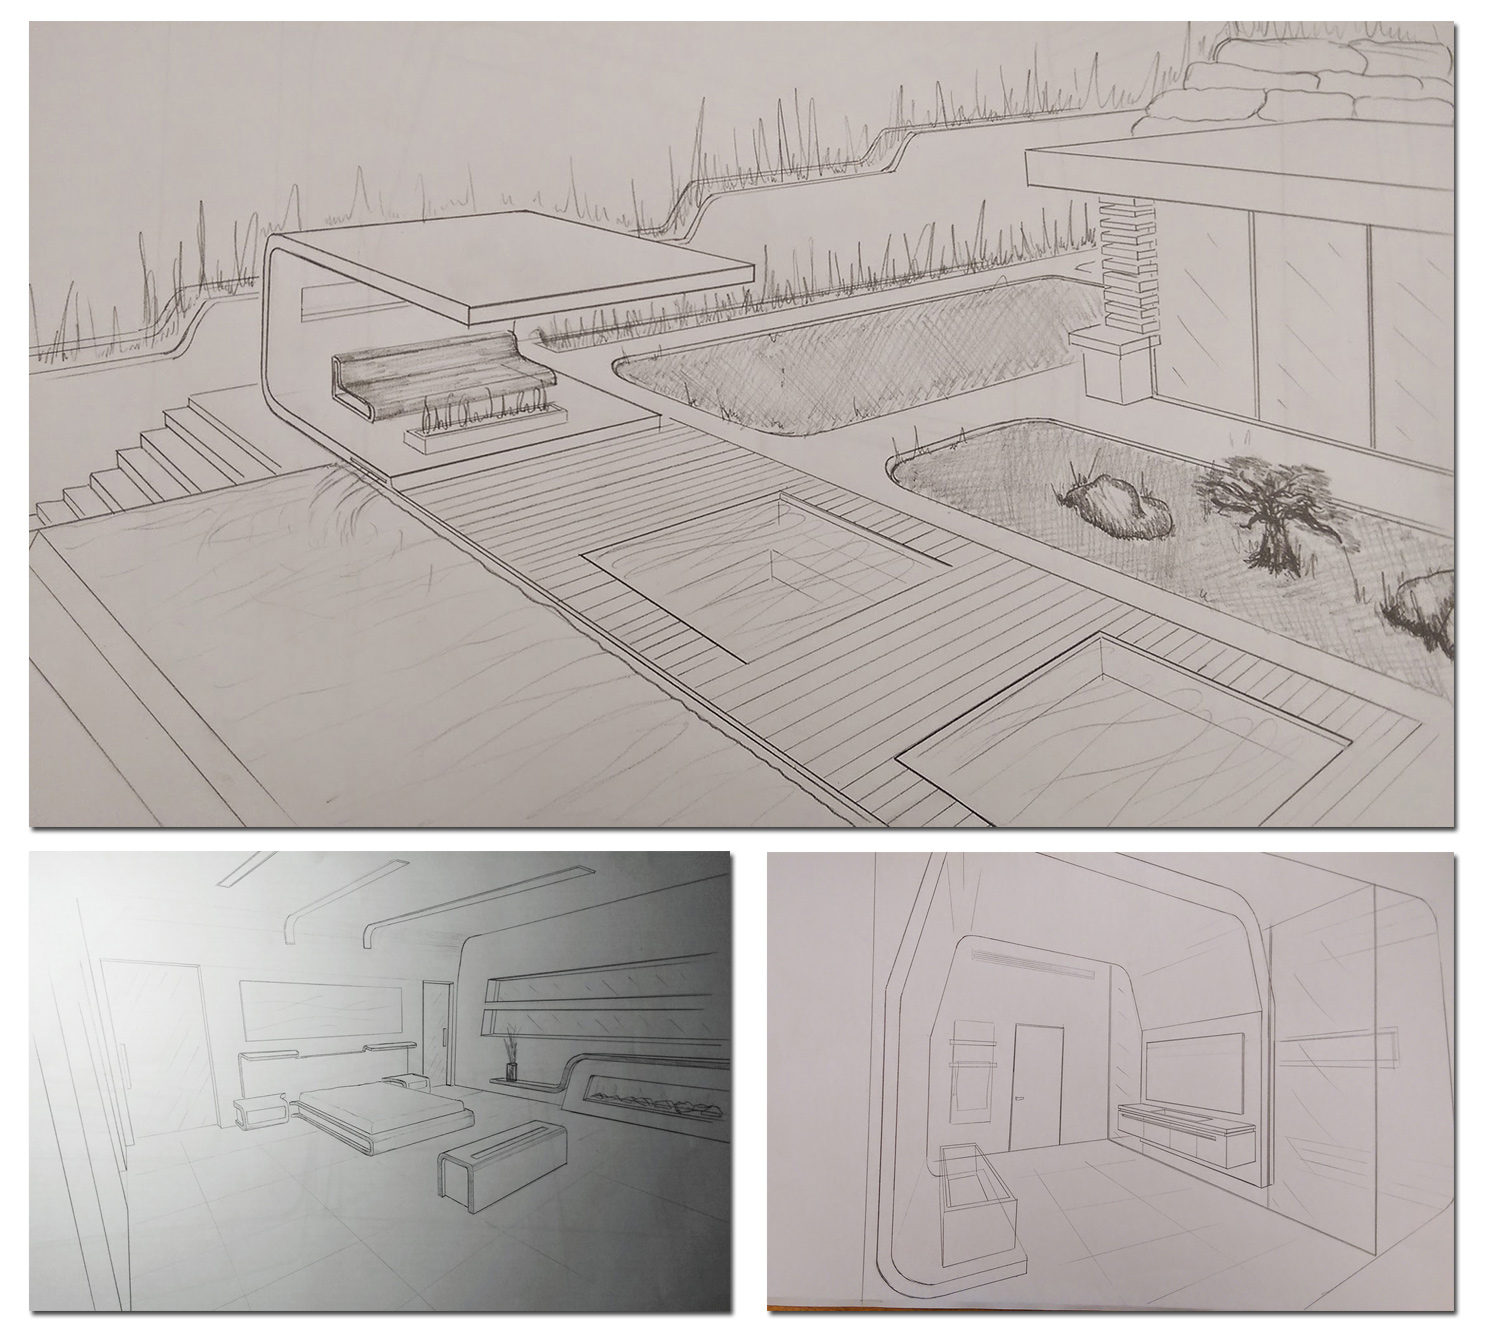 axons sketches 001 Ariel Isaac Franco Arch Studio}